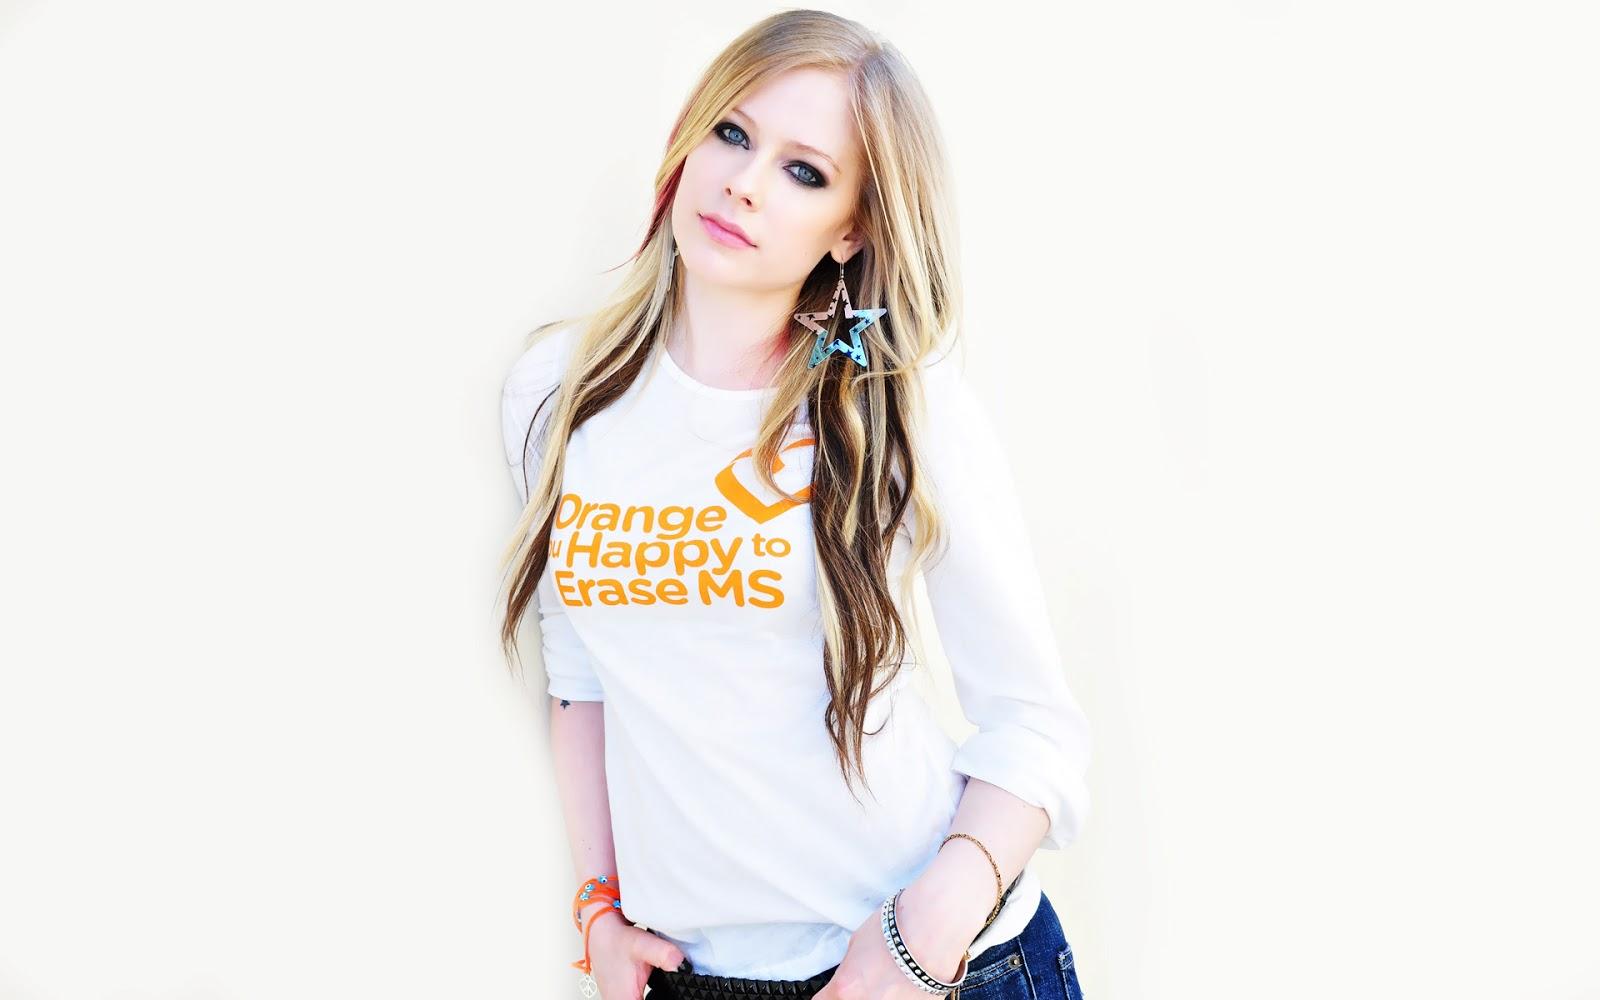 http://4.bp.blogspot.com/-YDpZ9Sx6sgI/UZTMyEvzvLI/AAAAAAAAAlQ/HCWIcphm81o/s1600/Avril+Lavigne+In+White+t-shirt+2013.jpg